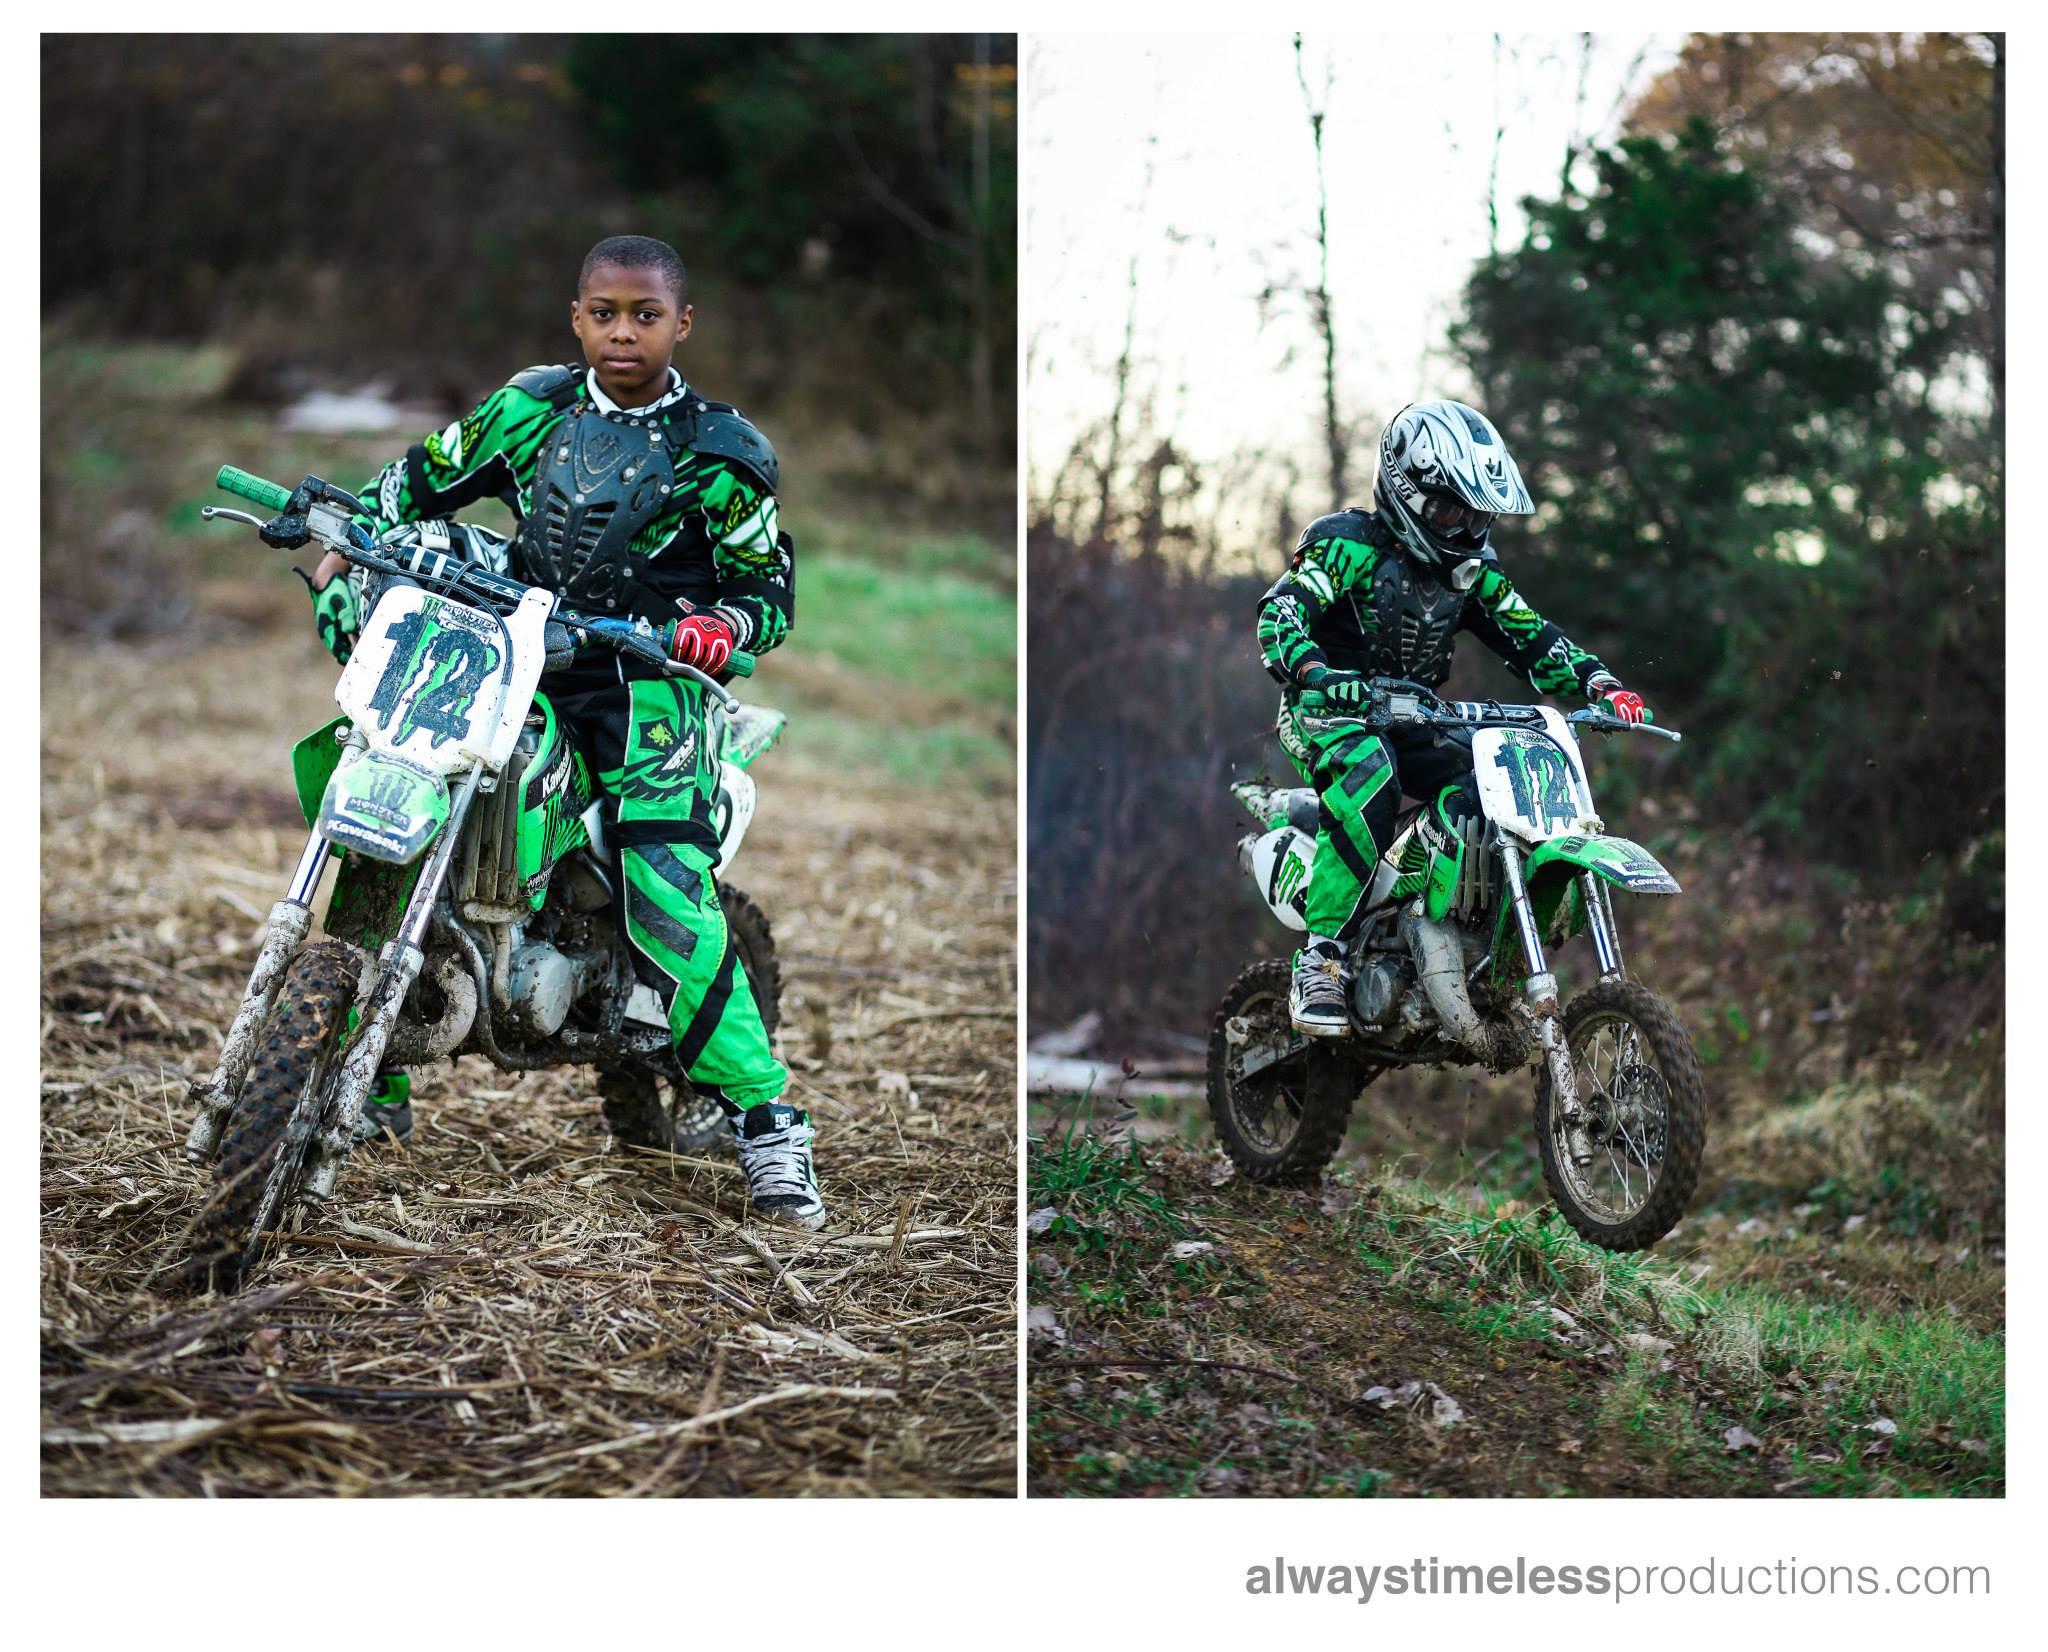 Bj The Phenom Dirt Bike Rider Always Timeless